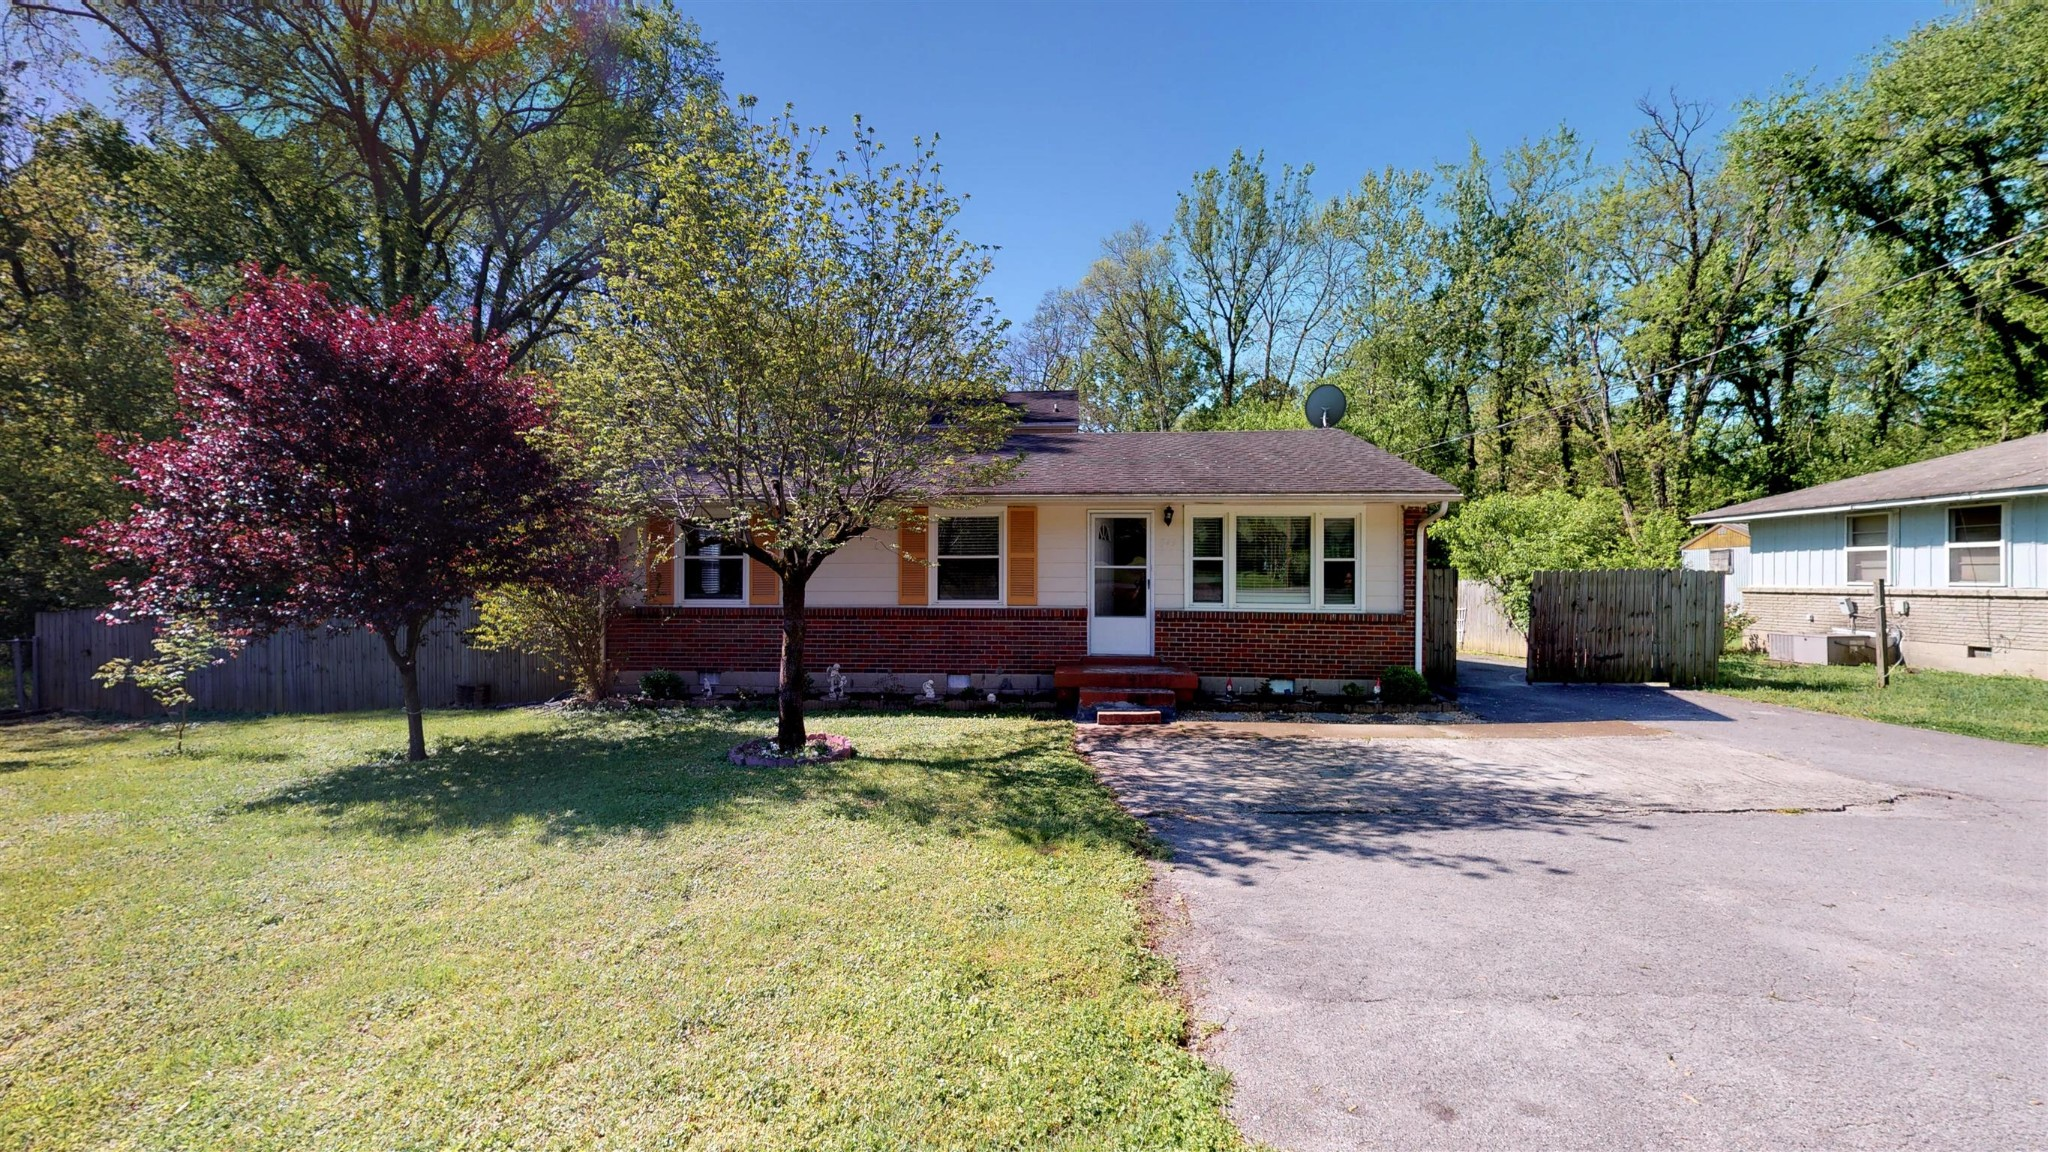 543 Elaine Dr Property Photo - Nashville, TN real estate listing